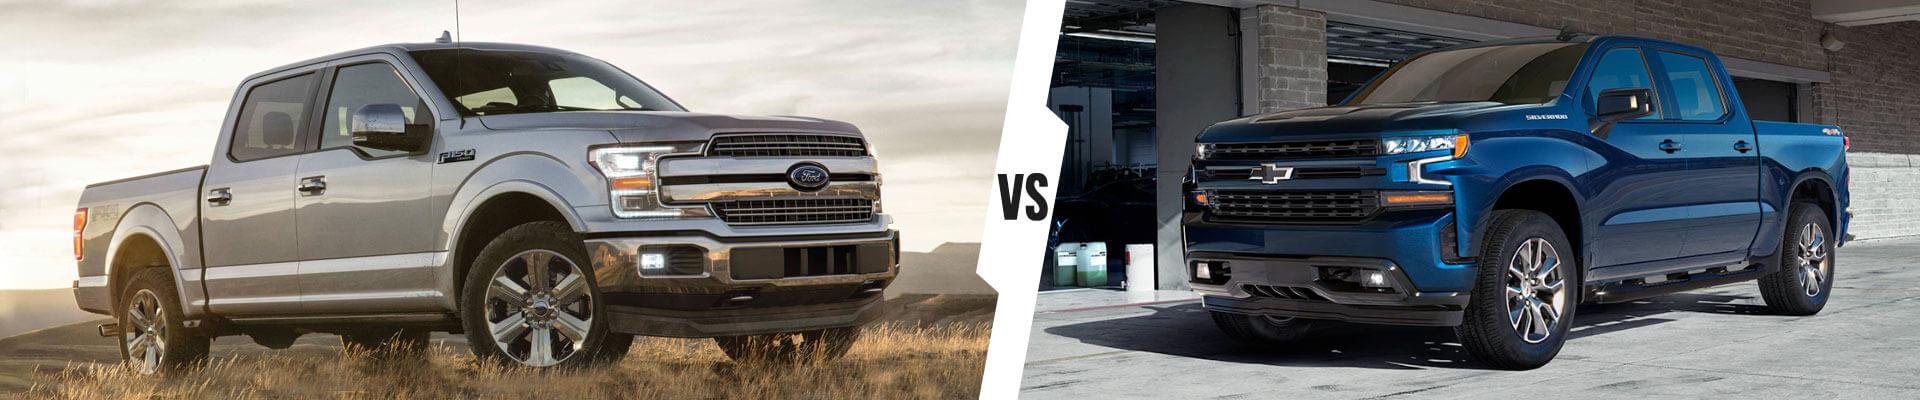 How the 2020 Chevrolet Silverado 1500 and the 2019 Ford F-150 Compare